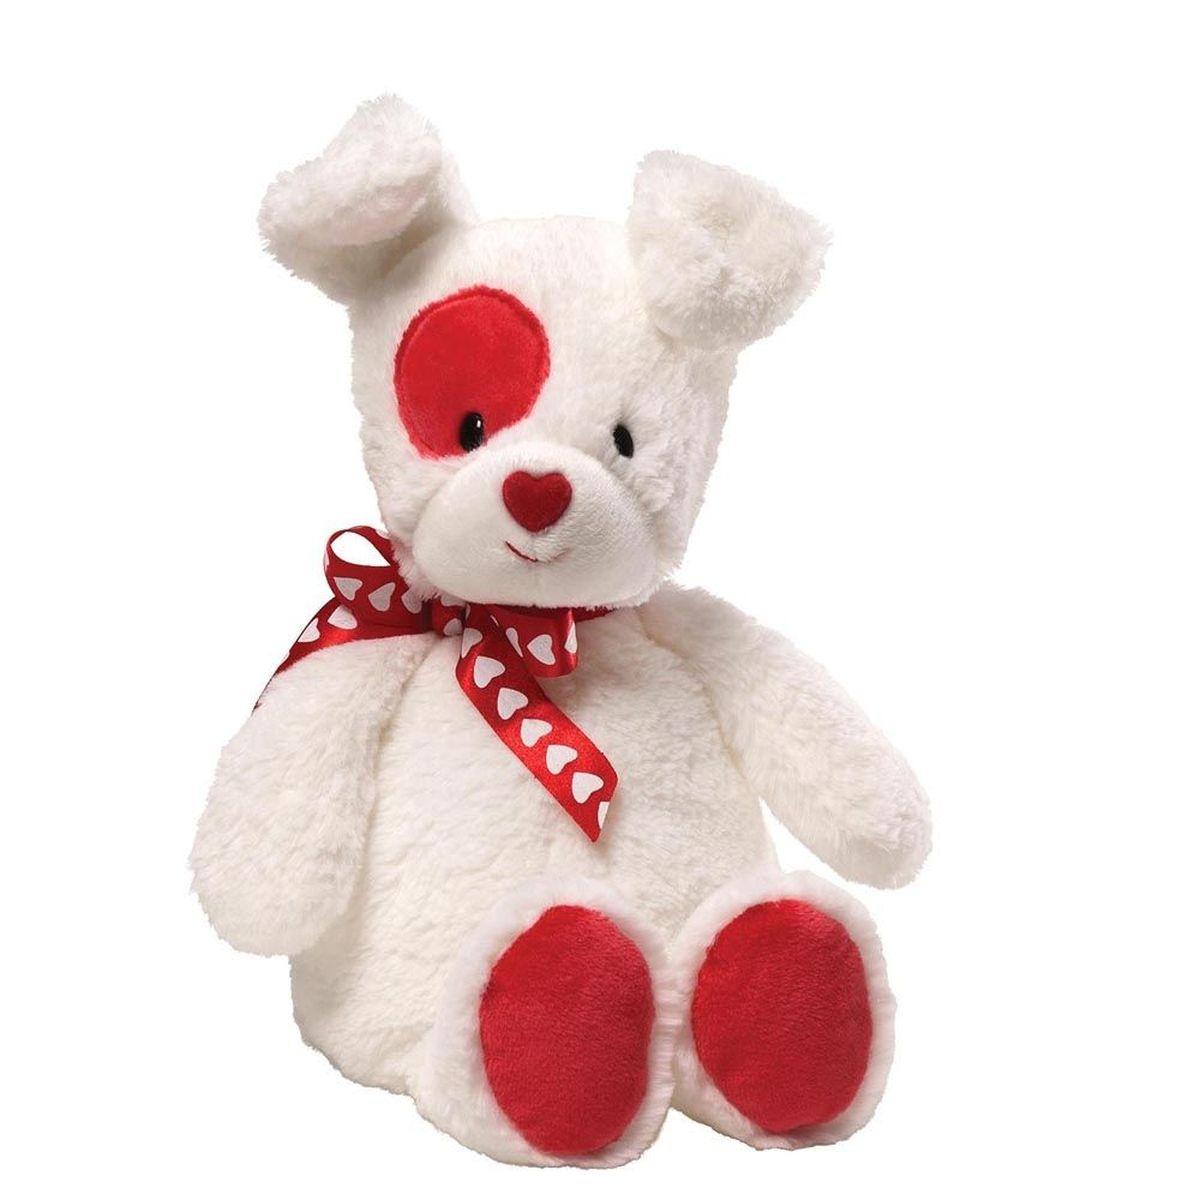 Gund Мягкая игрушка Love Patch 26,5 см gund мягкая игрушка собака love patch 26 5 см 2245522